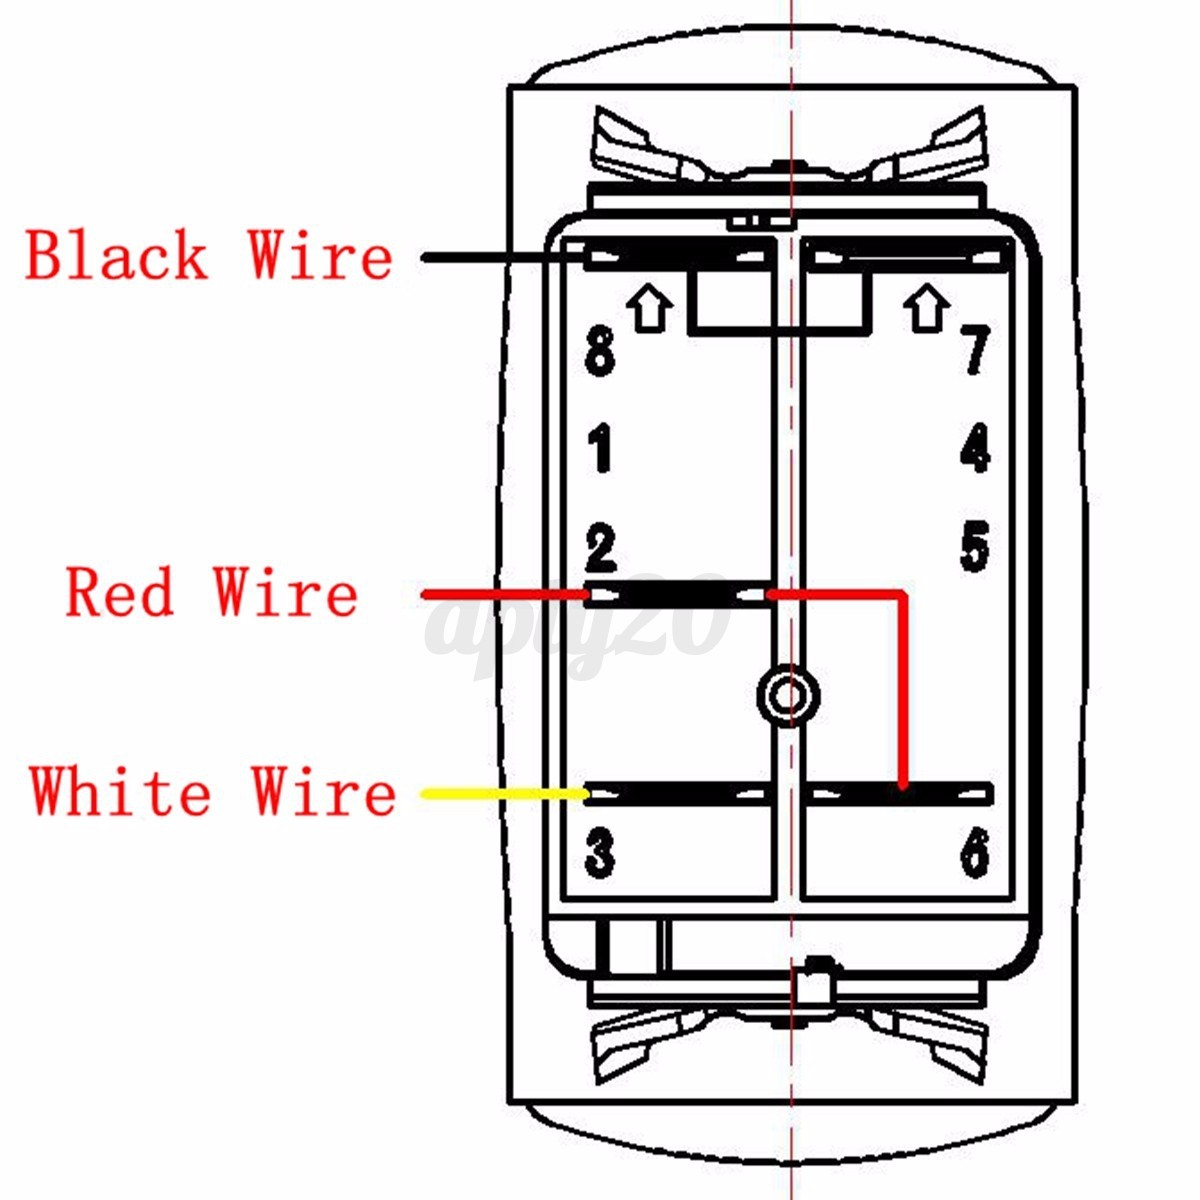 blue led light bar rocker switch wiring harness 40a relay fuse 12v suv atv jeep ebay